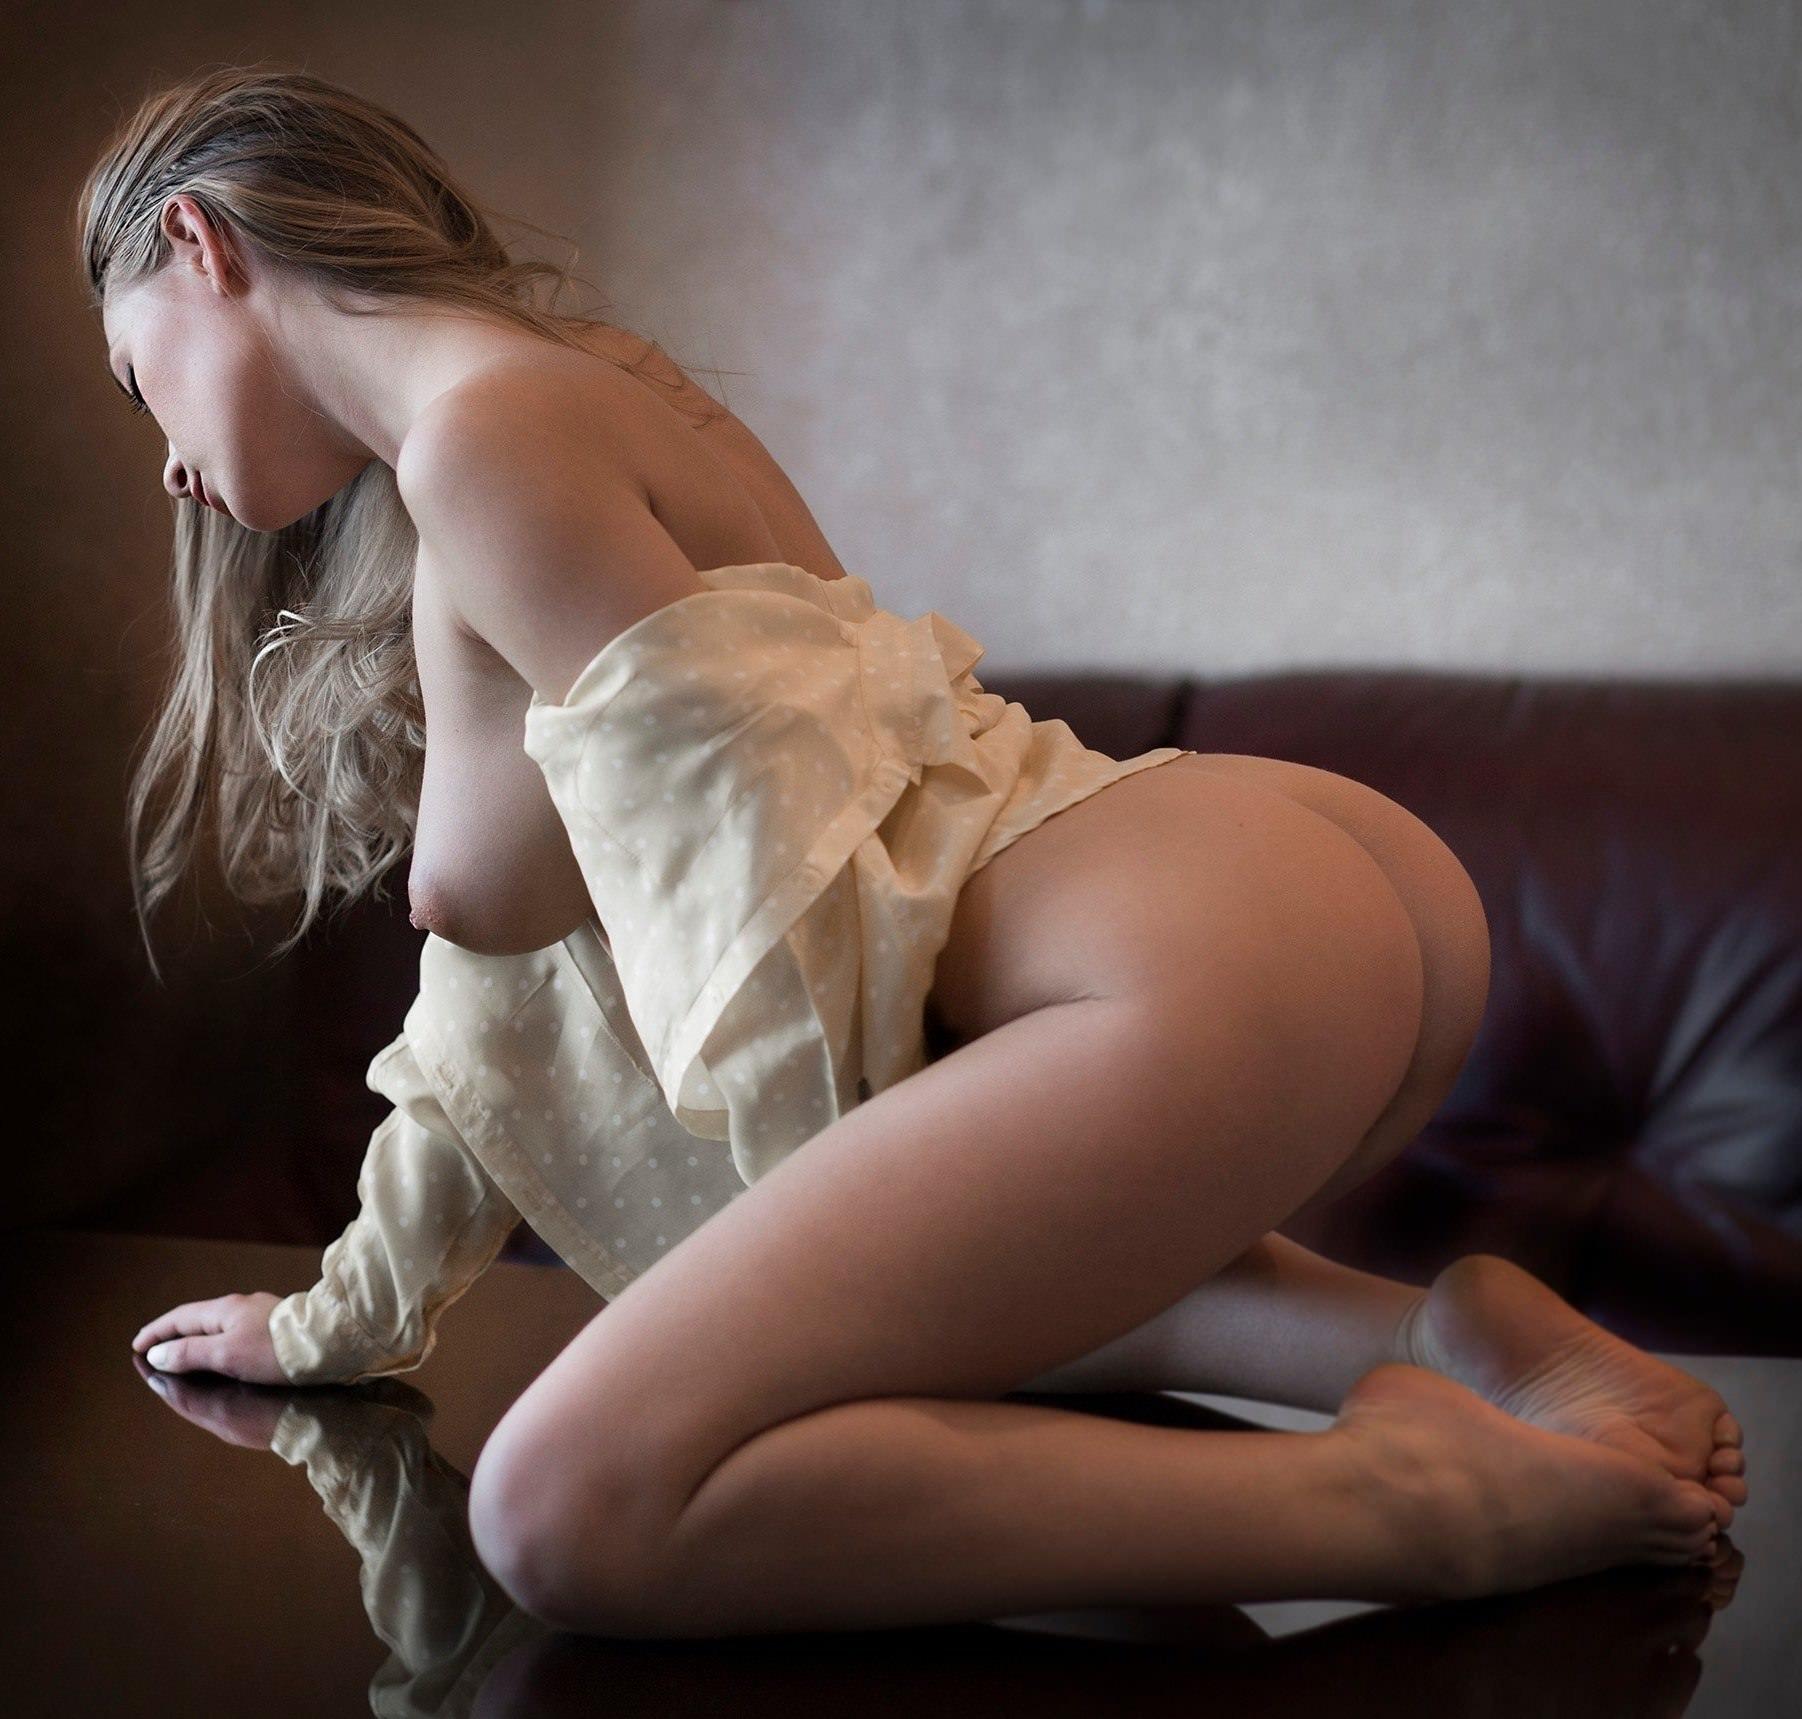 Glamour ass kneeling exposedpantiesnude girls hot kneeling